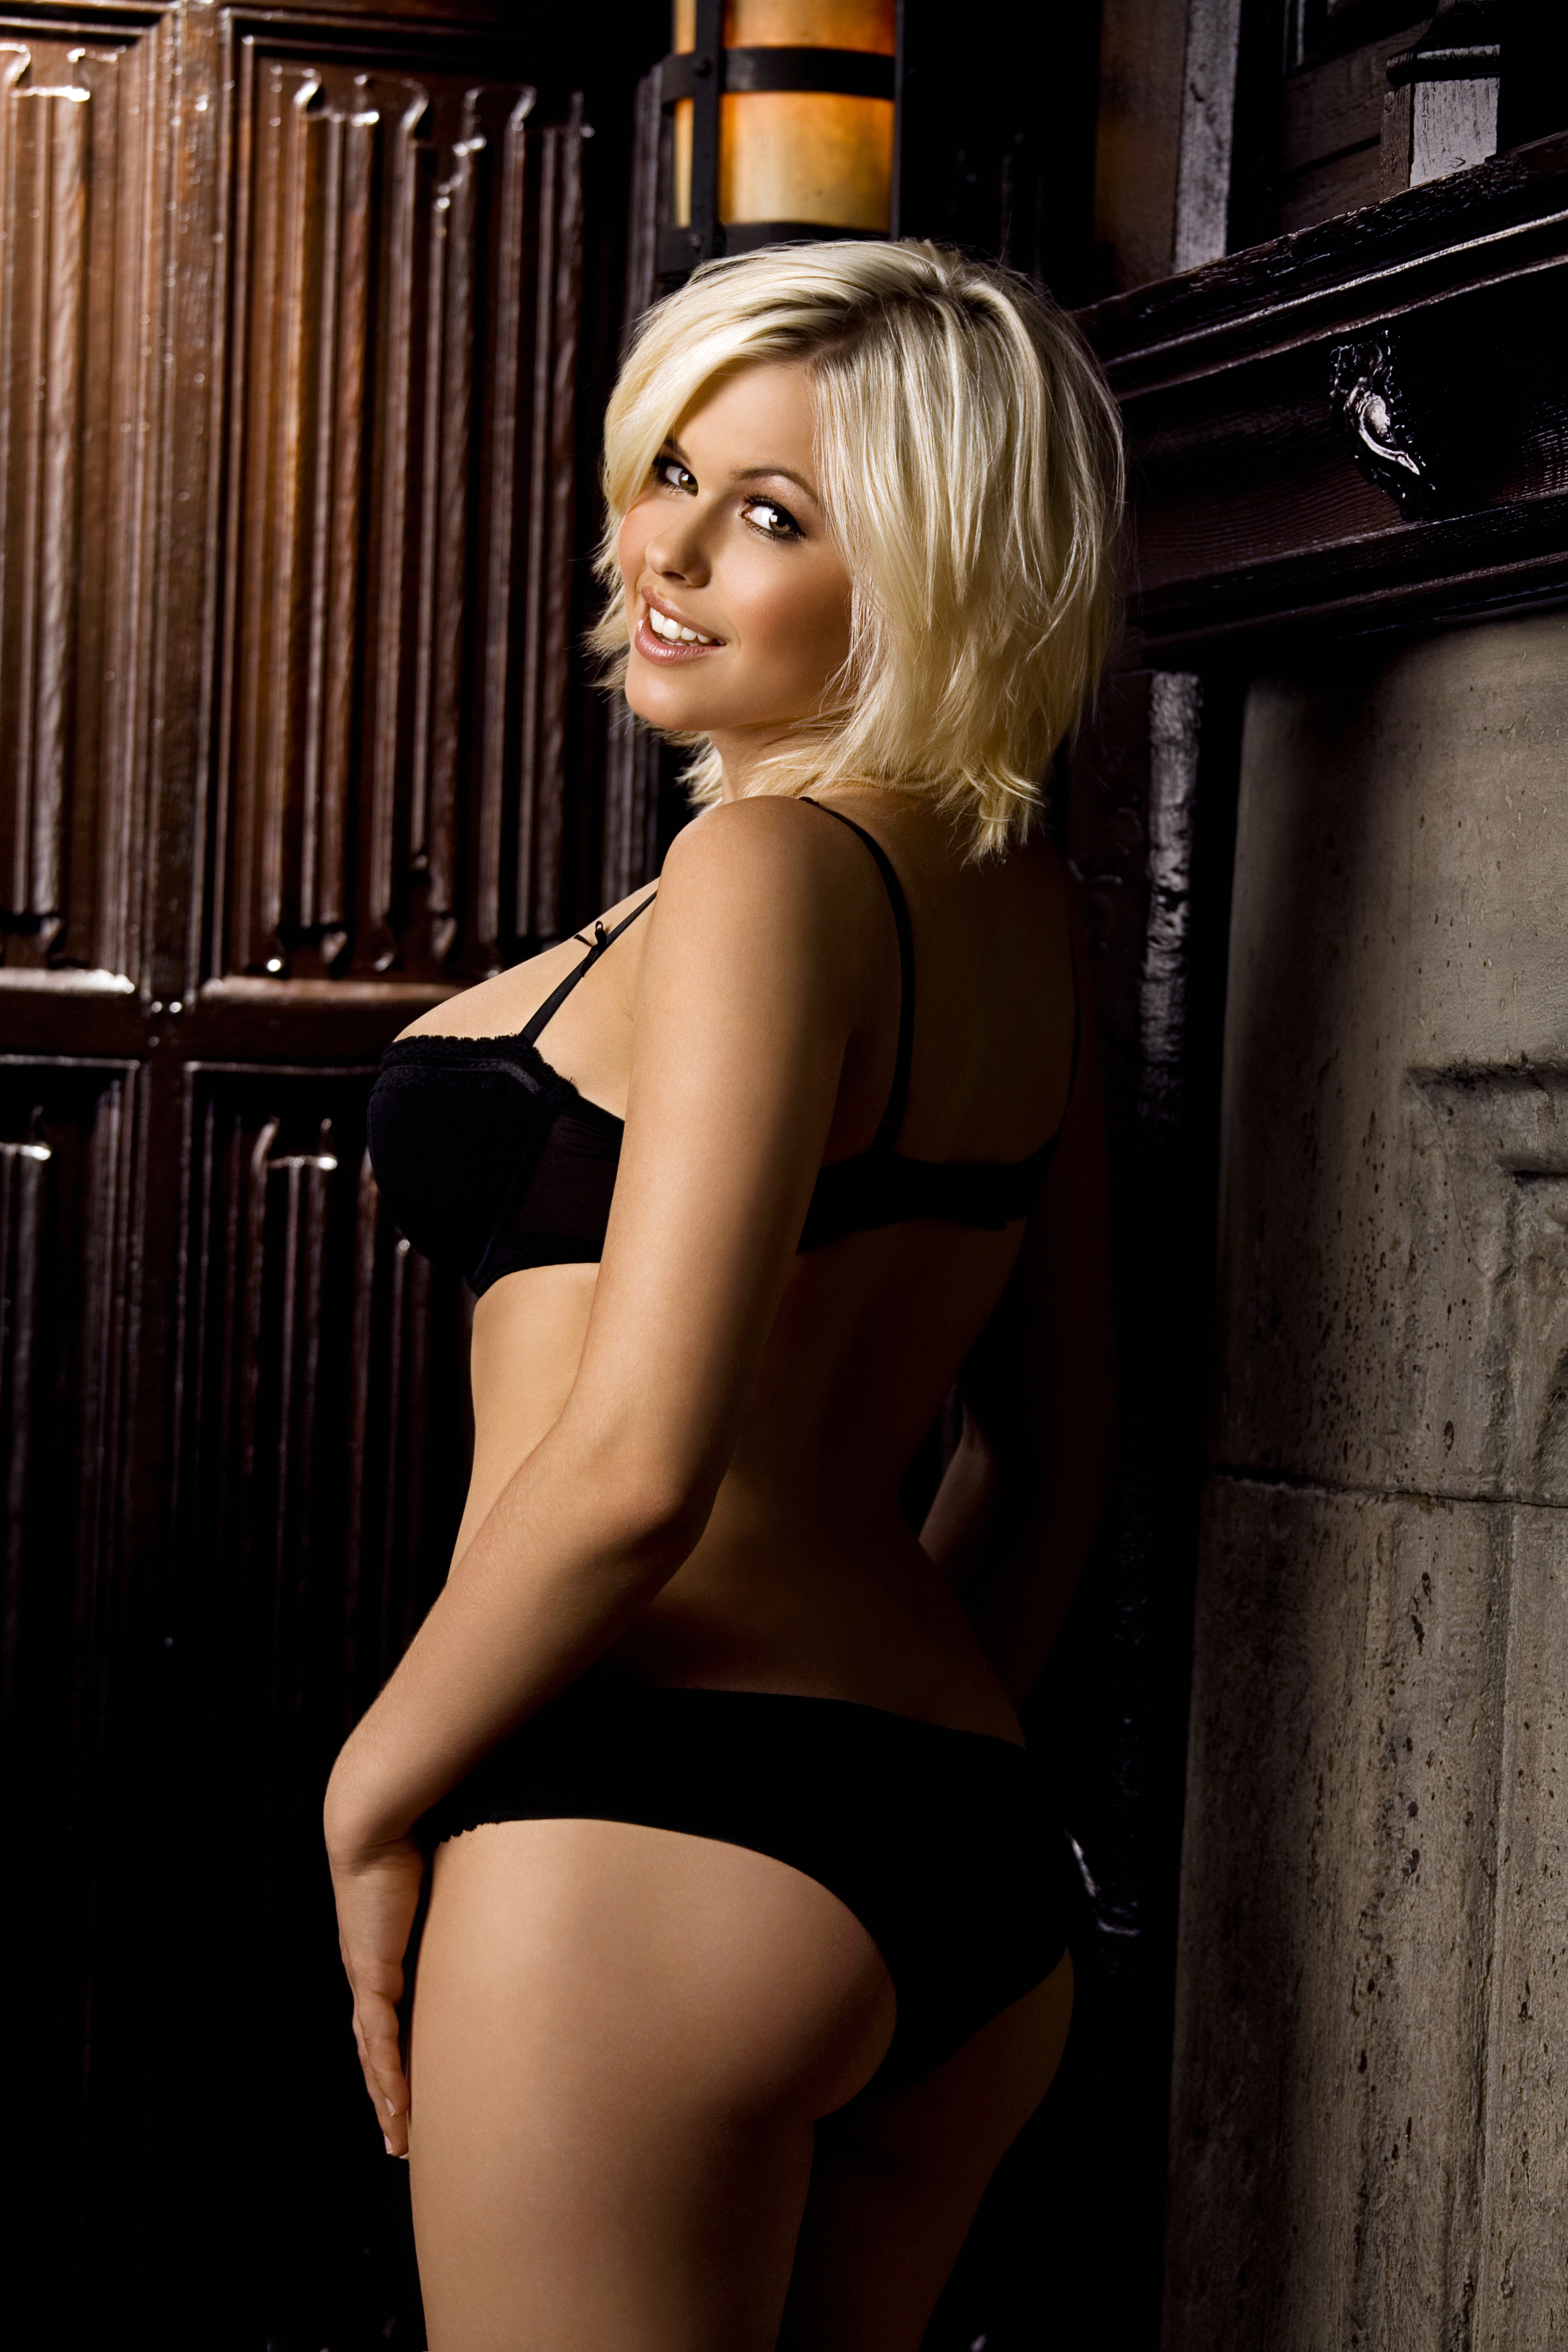 Eva wyrwal boobs blonde naked marcus mays 01 RedBust